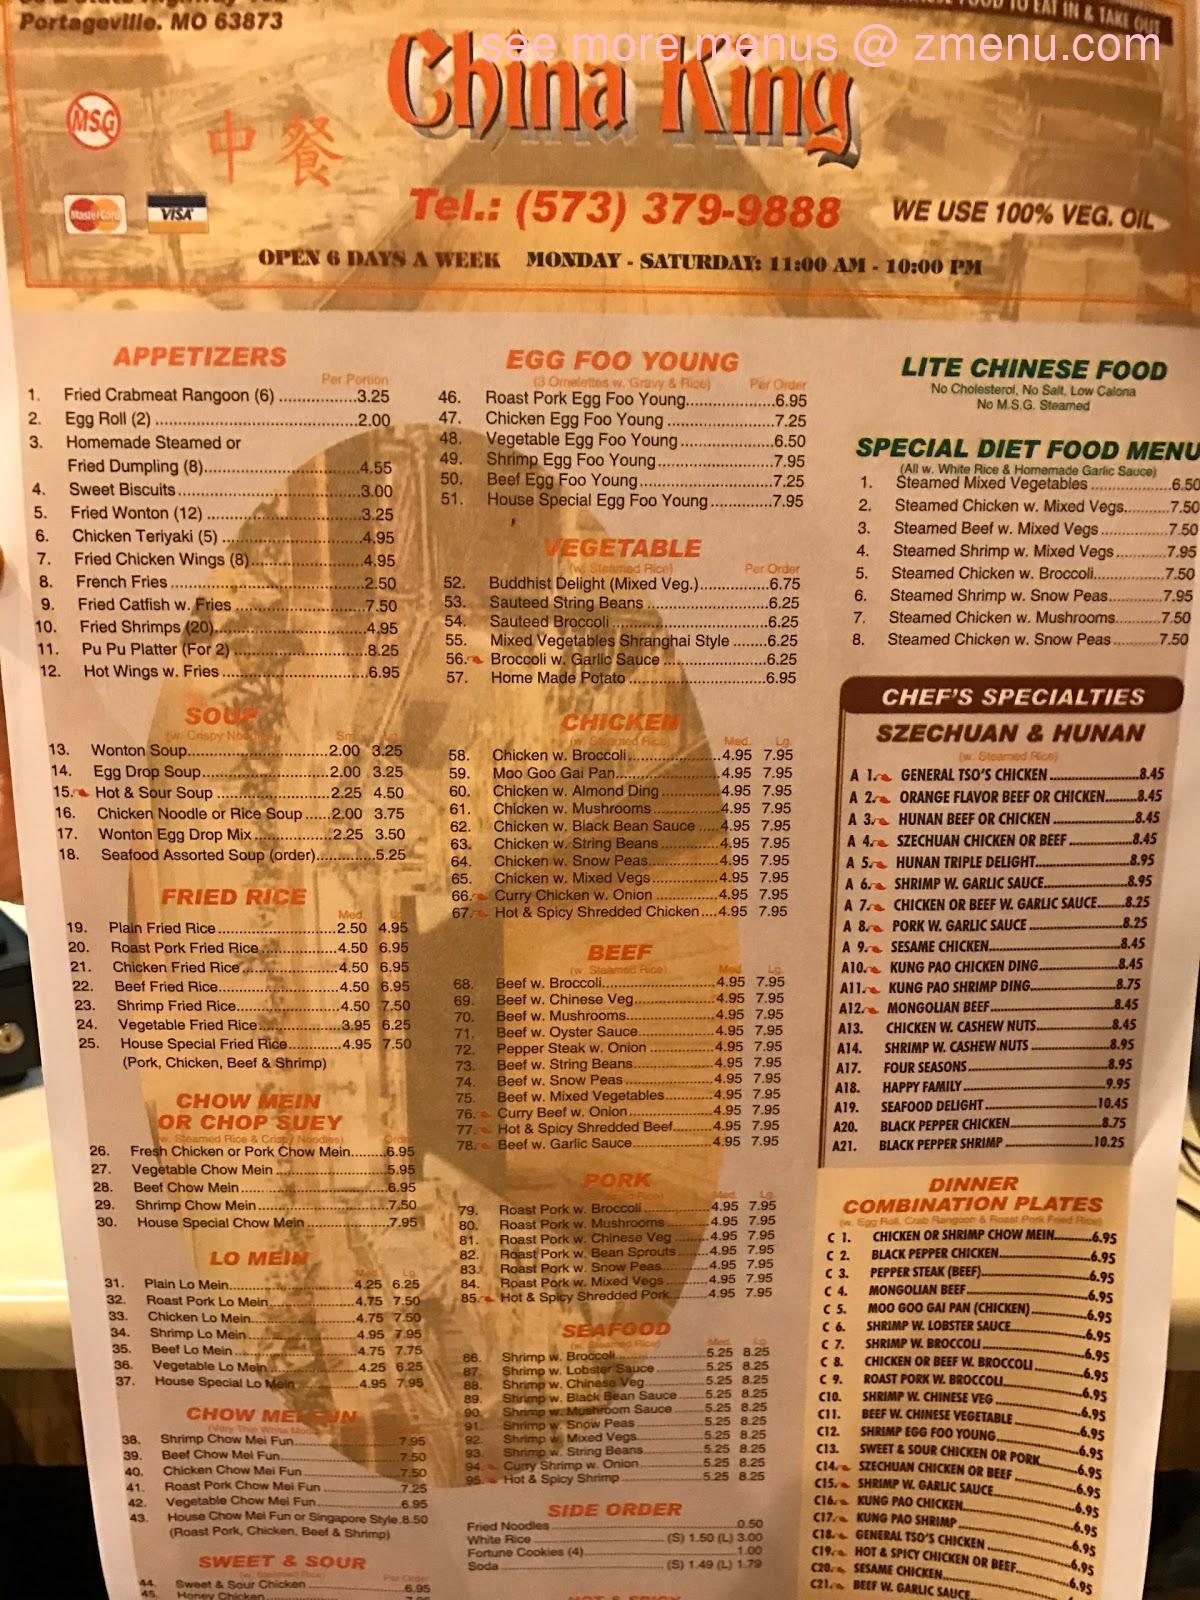 Online Menu Of China King Restaurant Portageville Missouri 63873 Zmenu